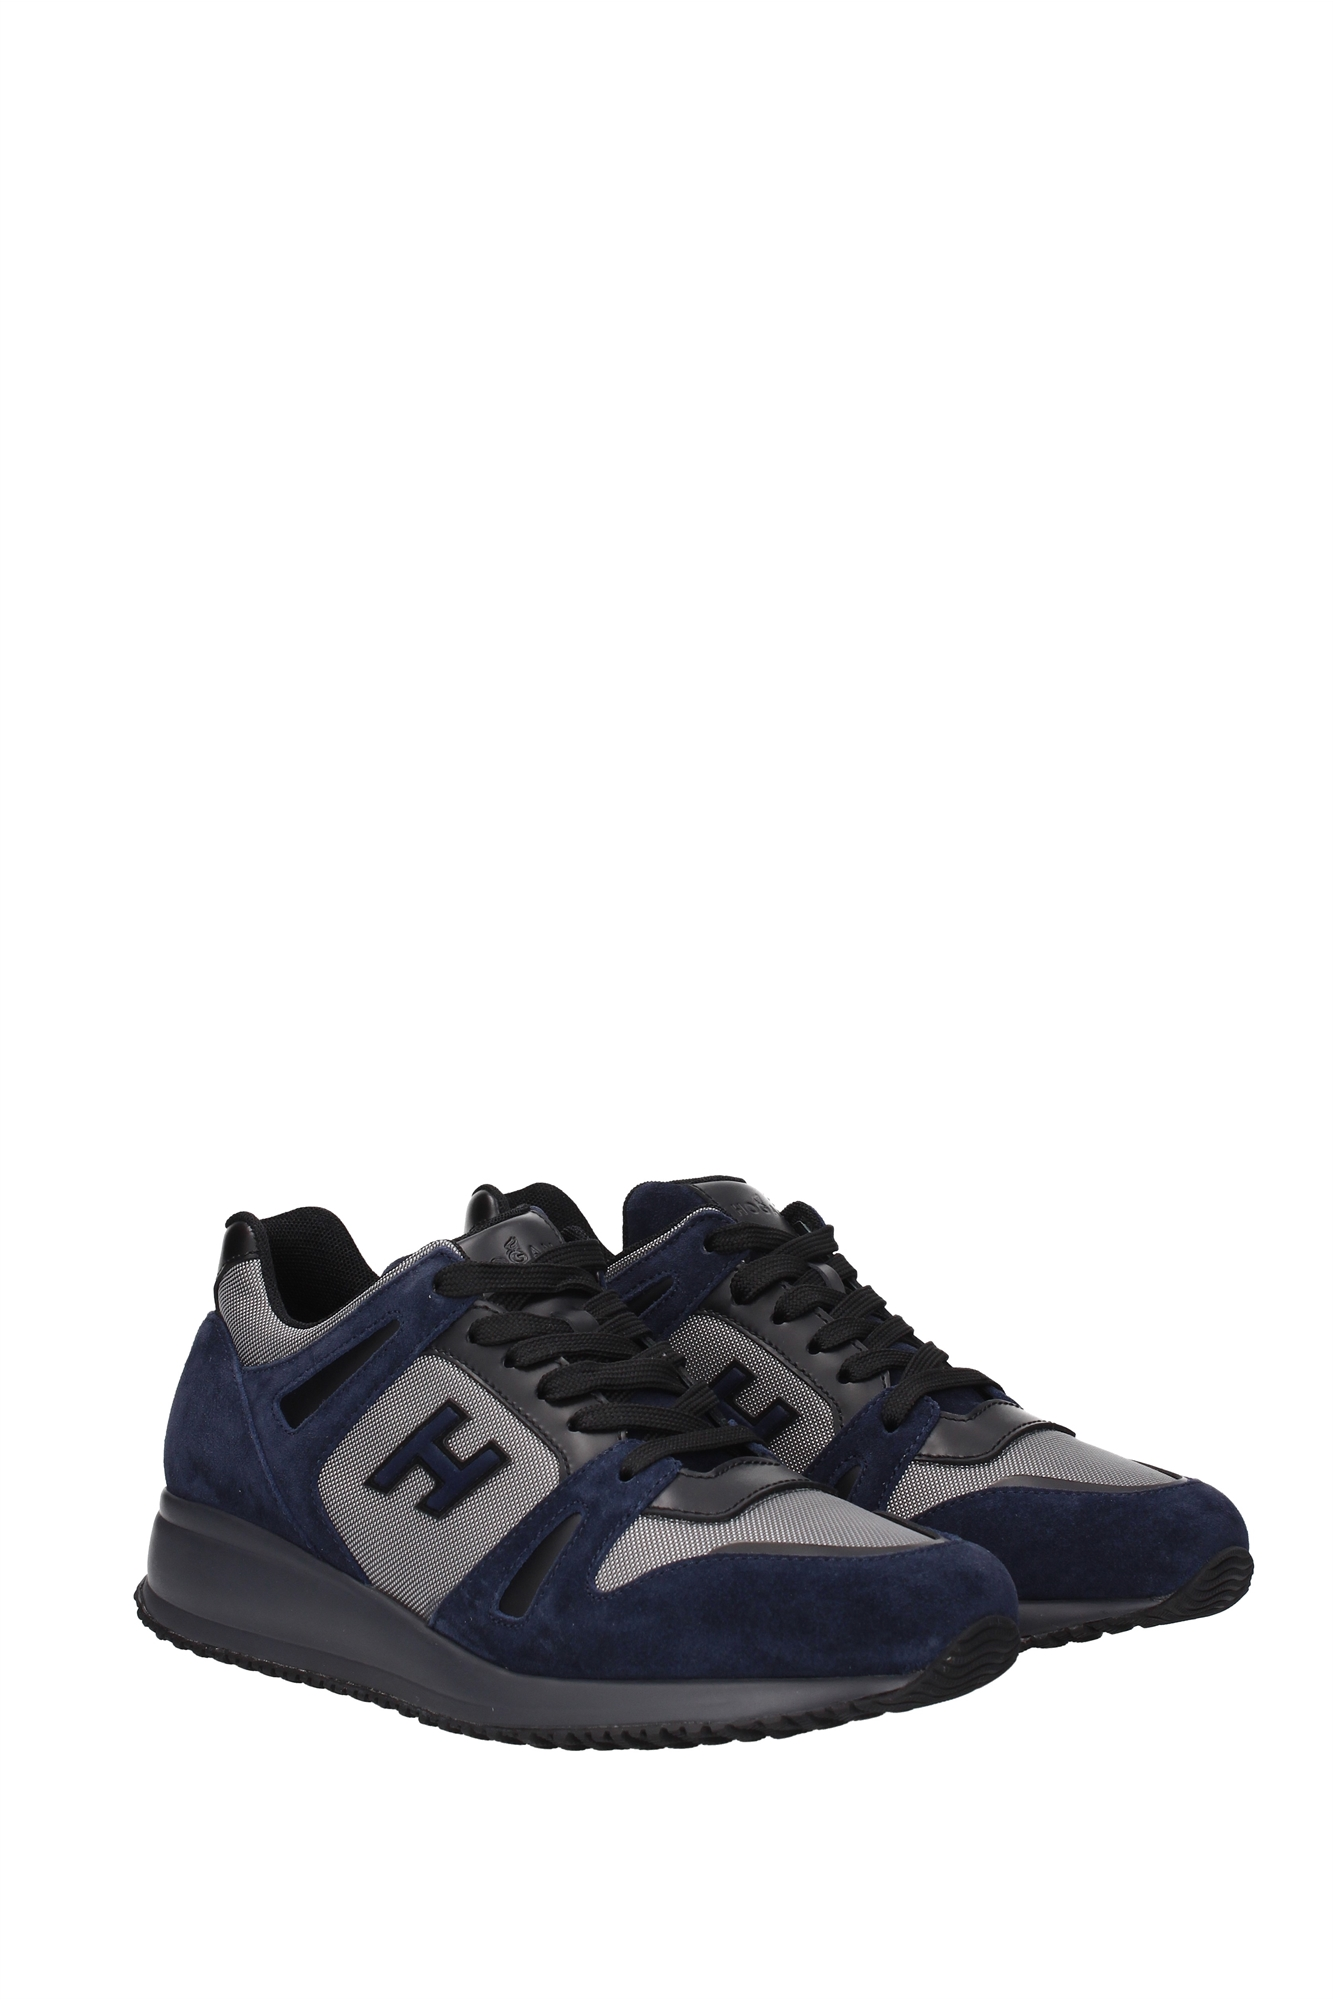 sneakers hogan herren wildleder blau hxm2460u871e6f8171. Black Bedroom Furniture Sets. Home Design Ideas